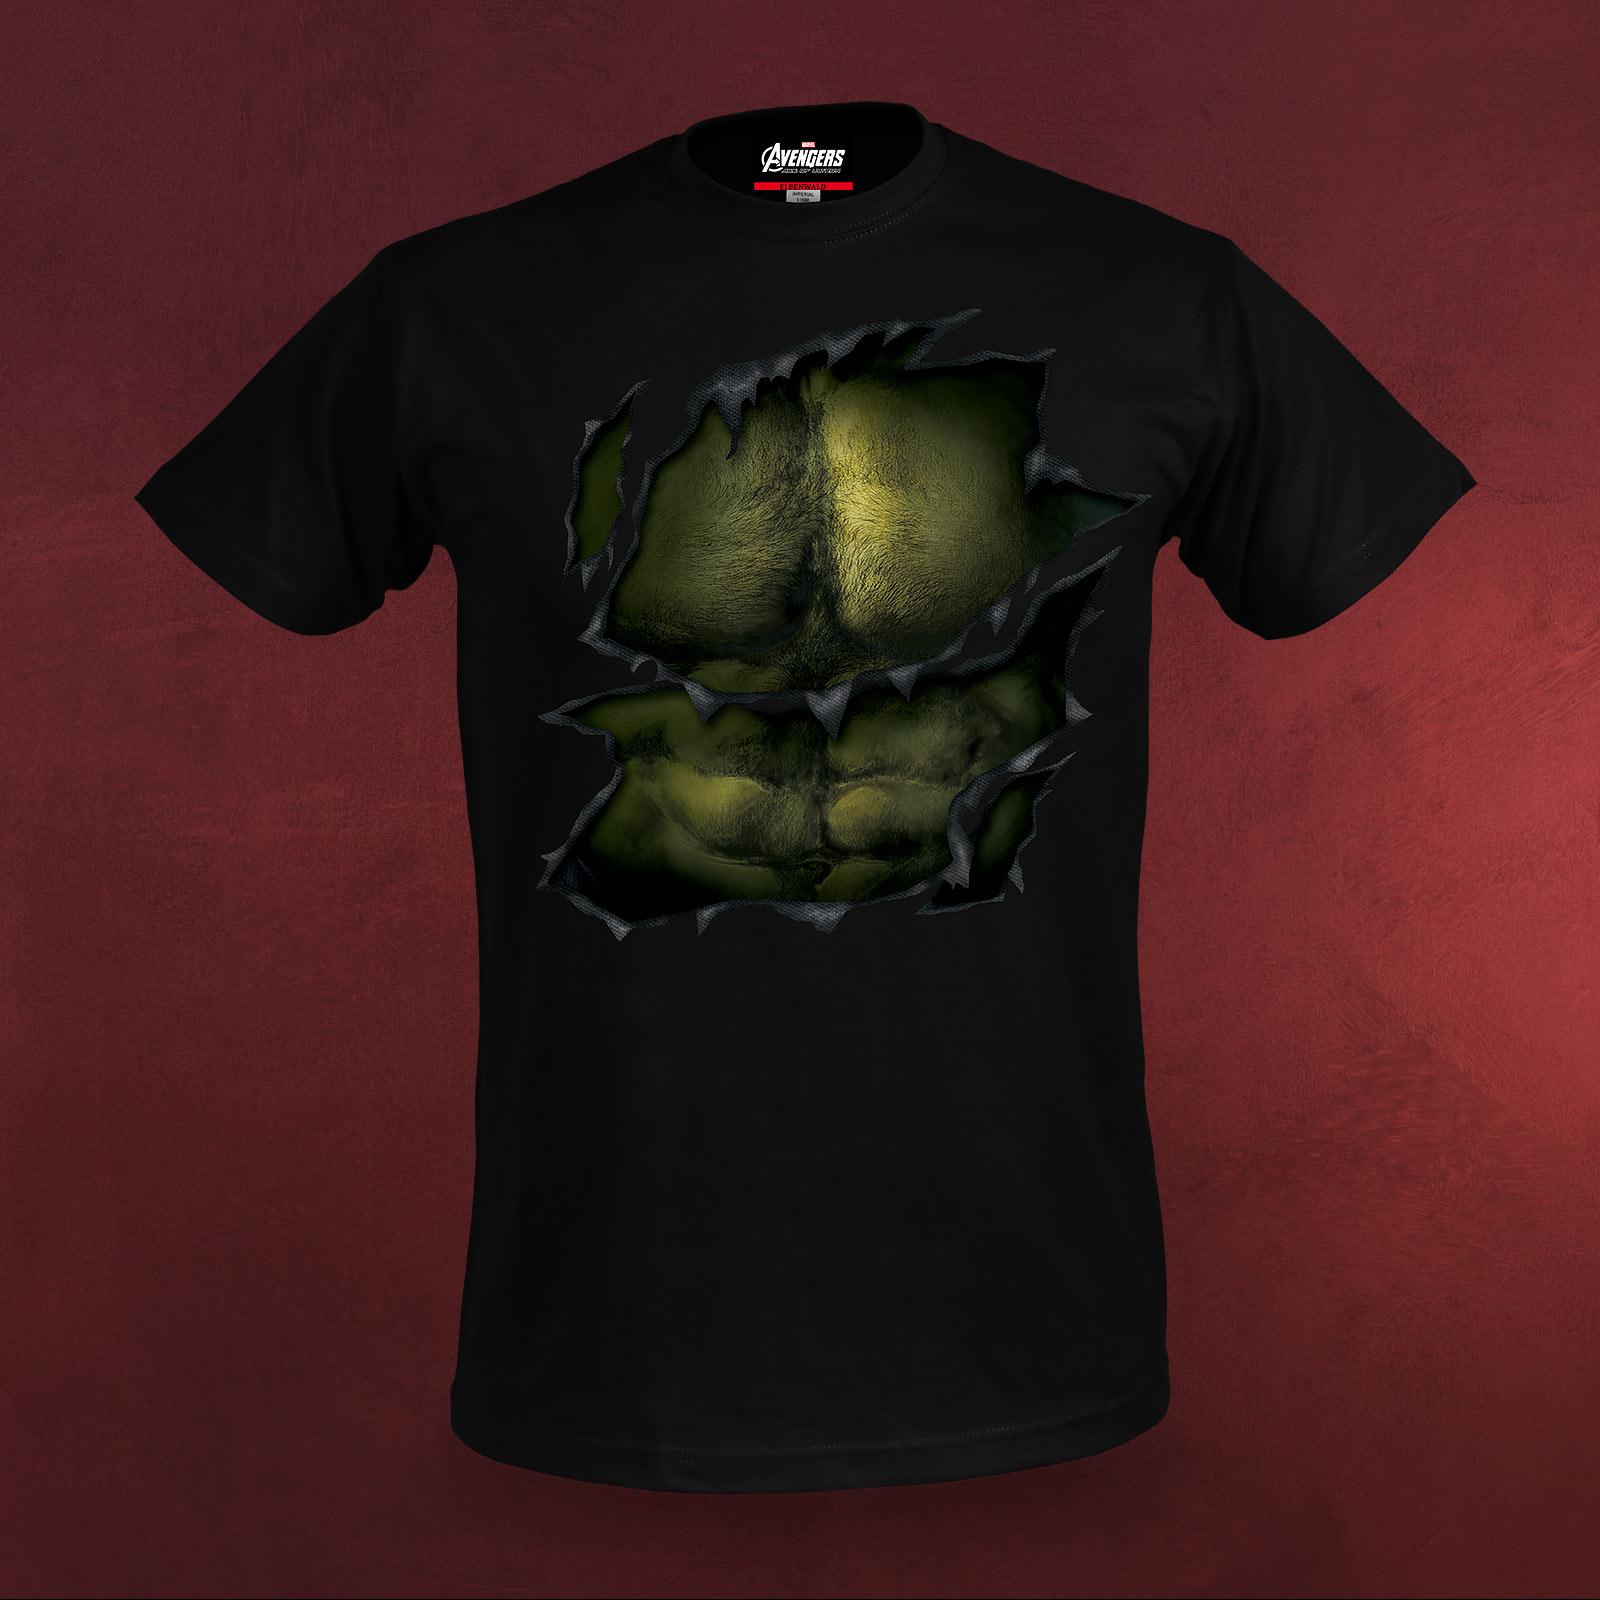 avengers age of ultron hulk muskel t shirt marvel lizenziert bw schwarz ebay. Black Bedroom Furniture Sets. Home Design Ideas